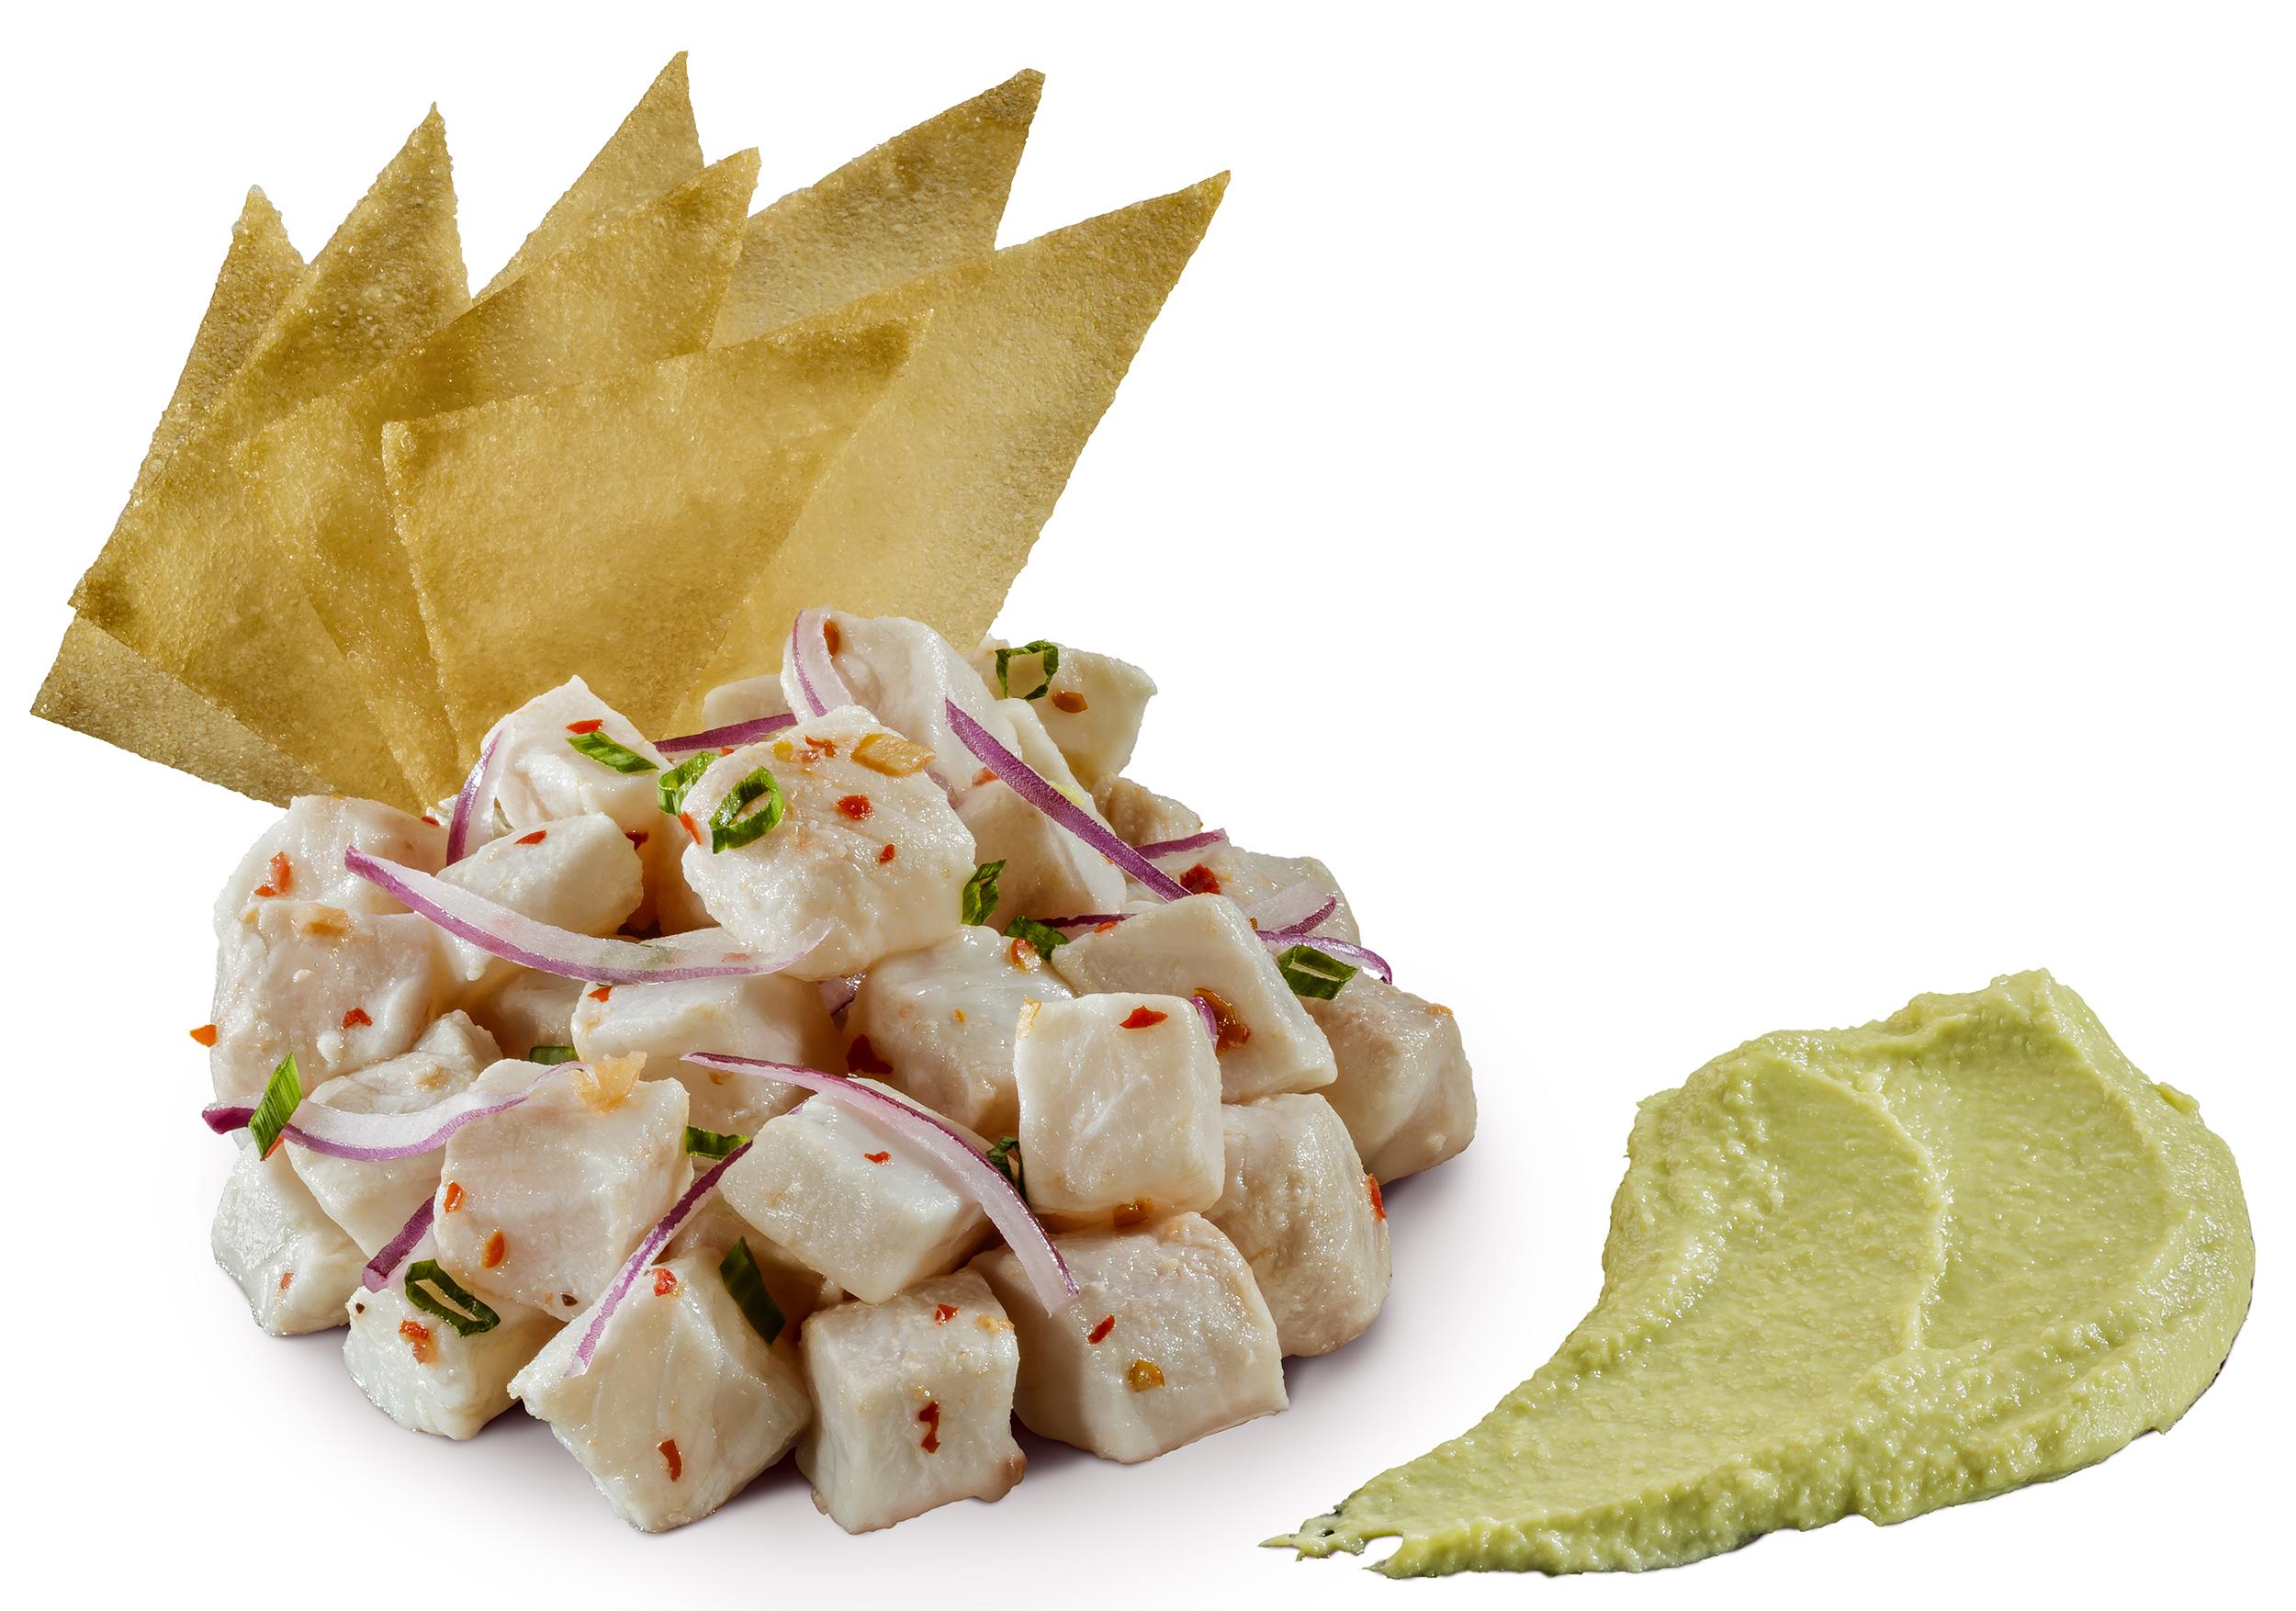 koni apresenta novos sabores chef shin koikee